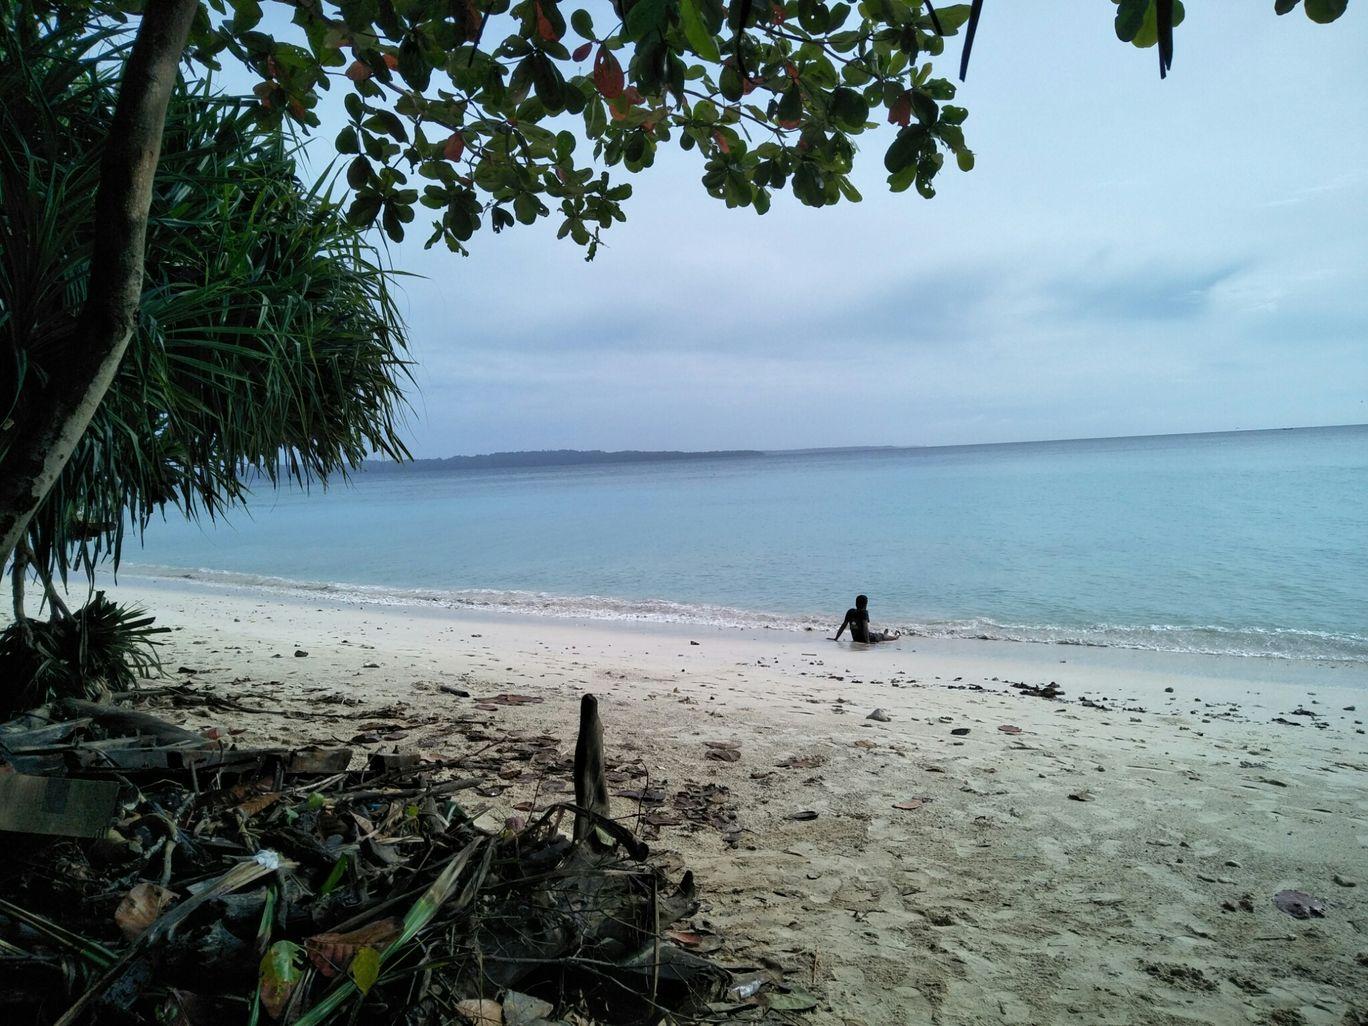 Photo of Andaman and Nicobar Islands By Balram Kashyap